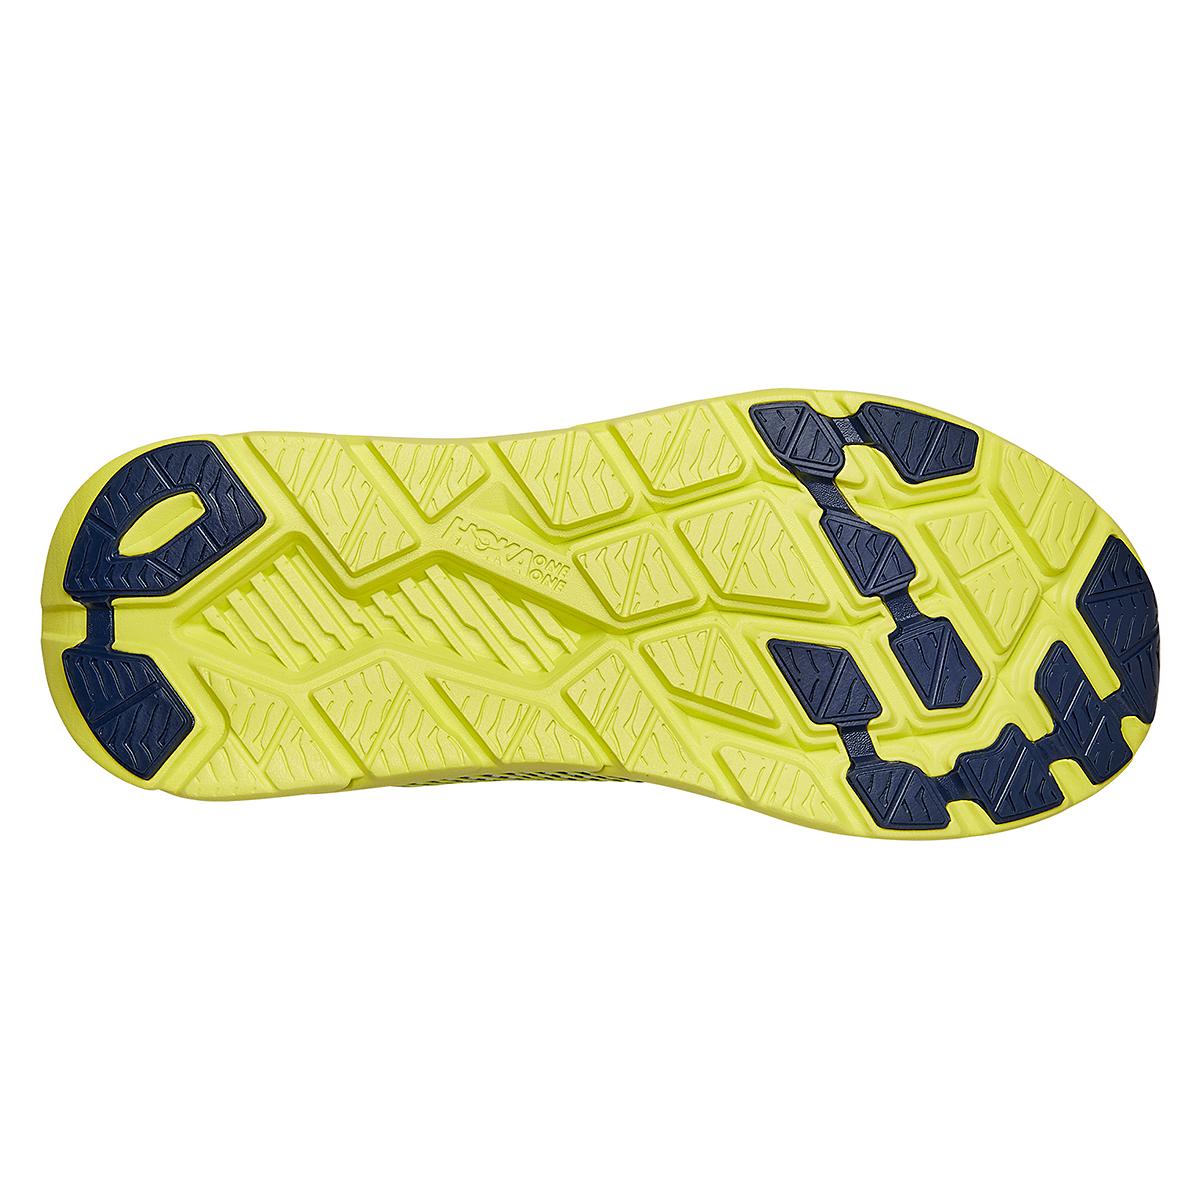 Men's Hoka One One Rincon 2 Running Shoe - Color: White/Yellow - Size: 7 - Width: Regular, White/Yellow, large, image 4